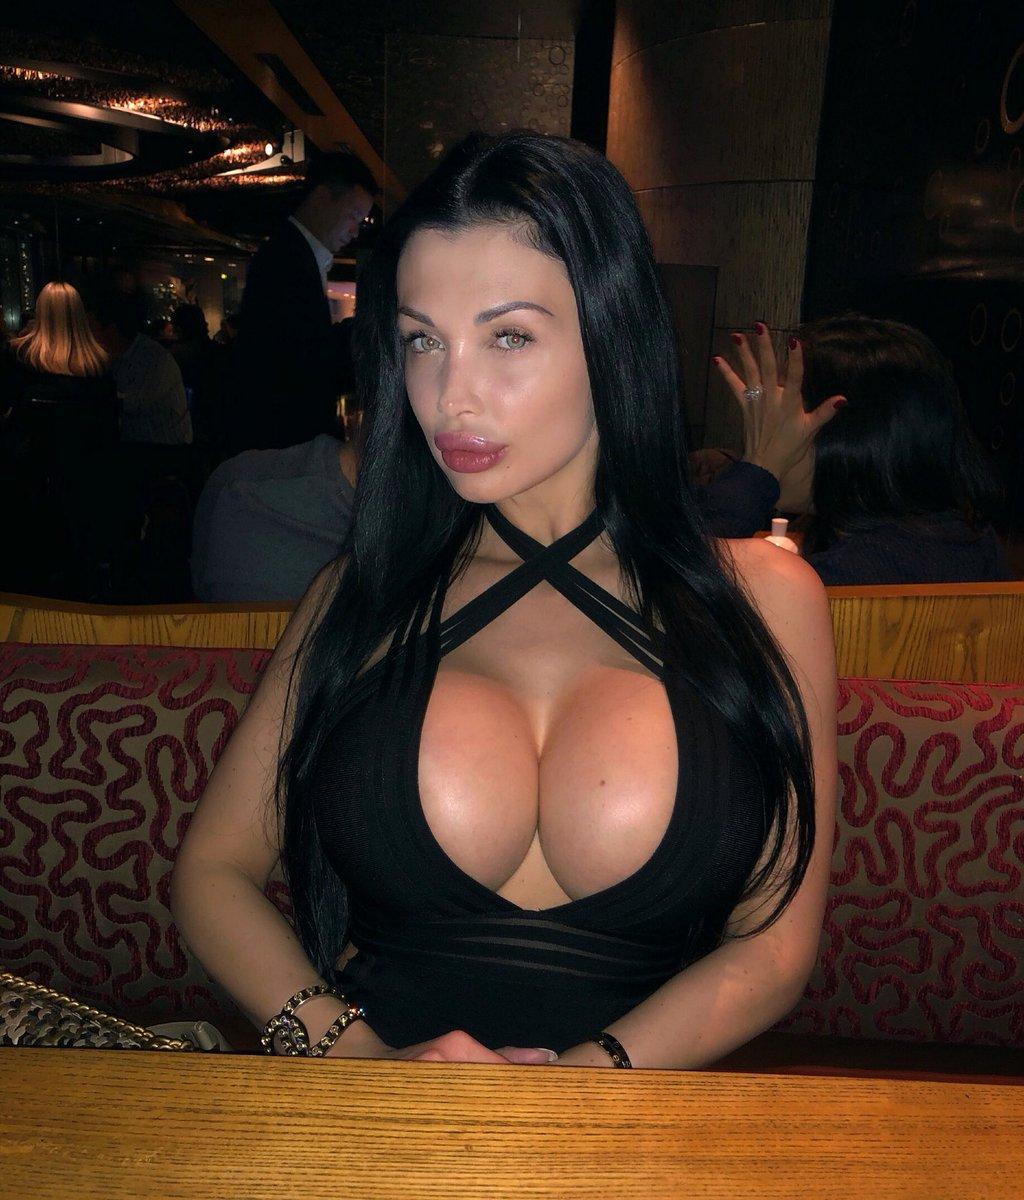 Aletta Ocean-pornstar twitter @ALETTAOCEANXXXX